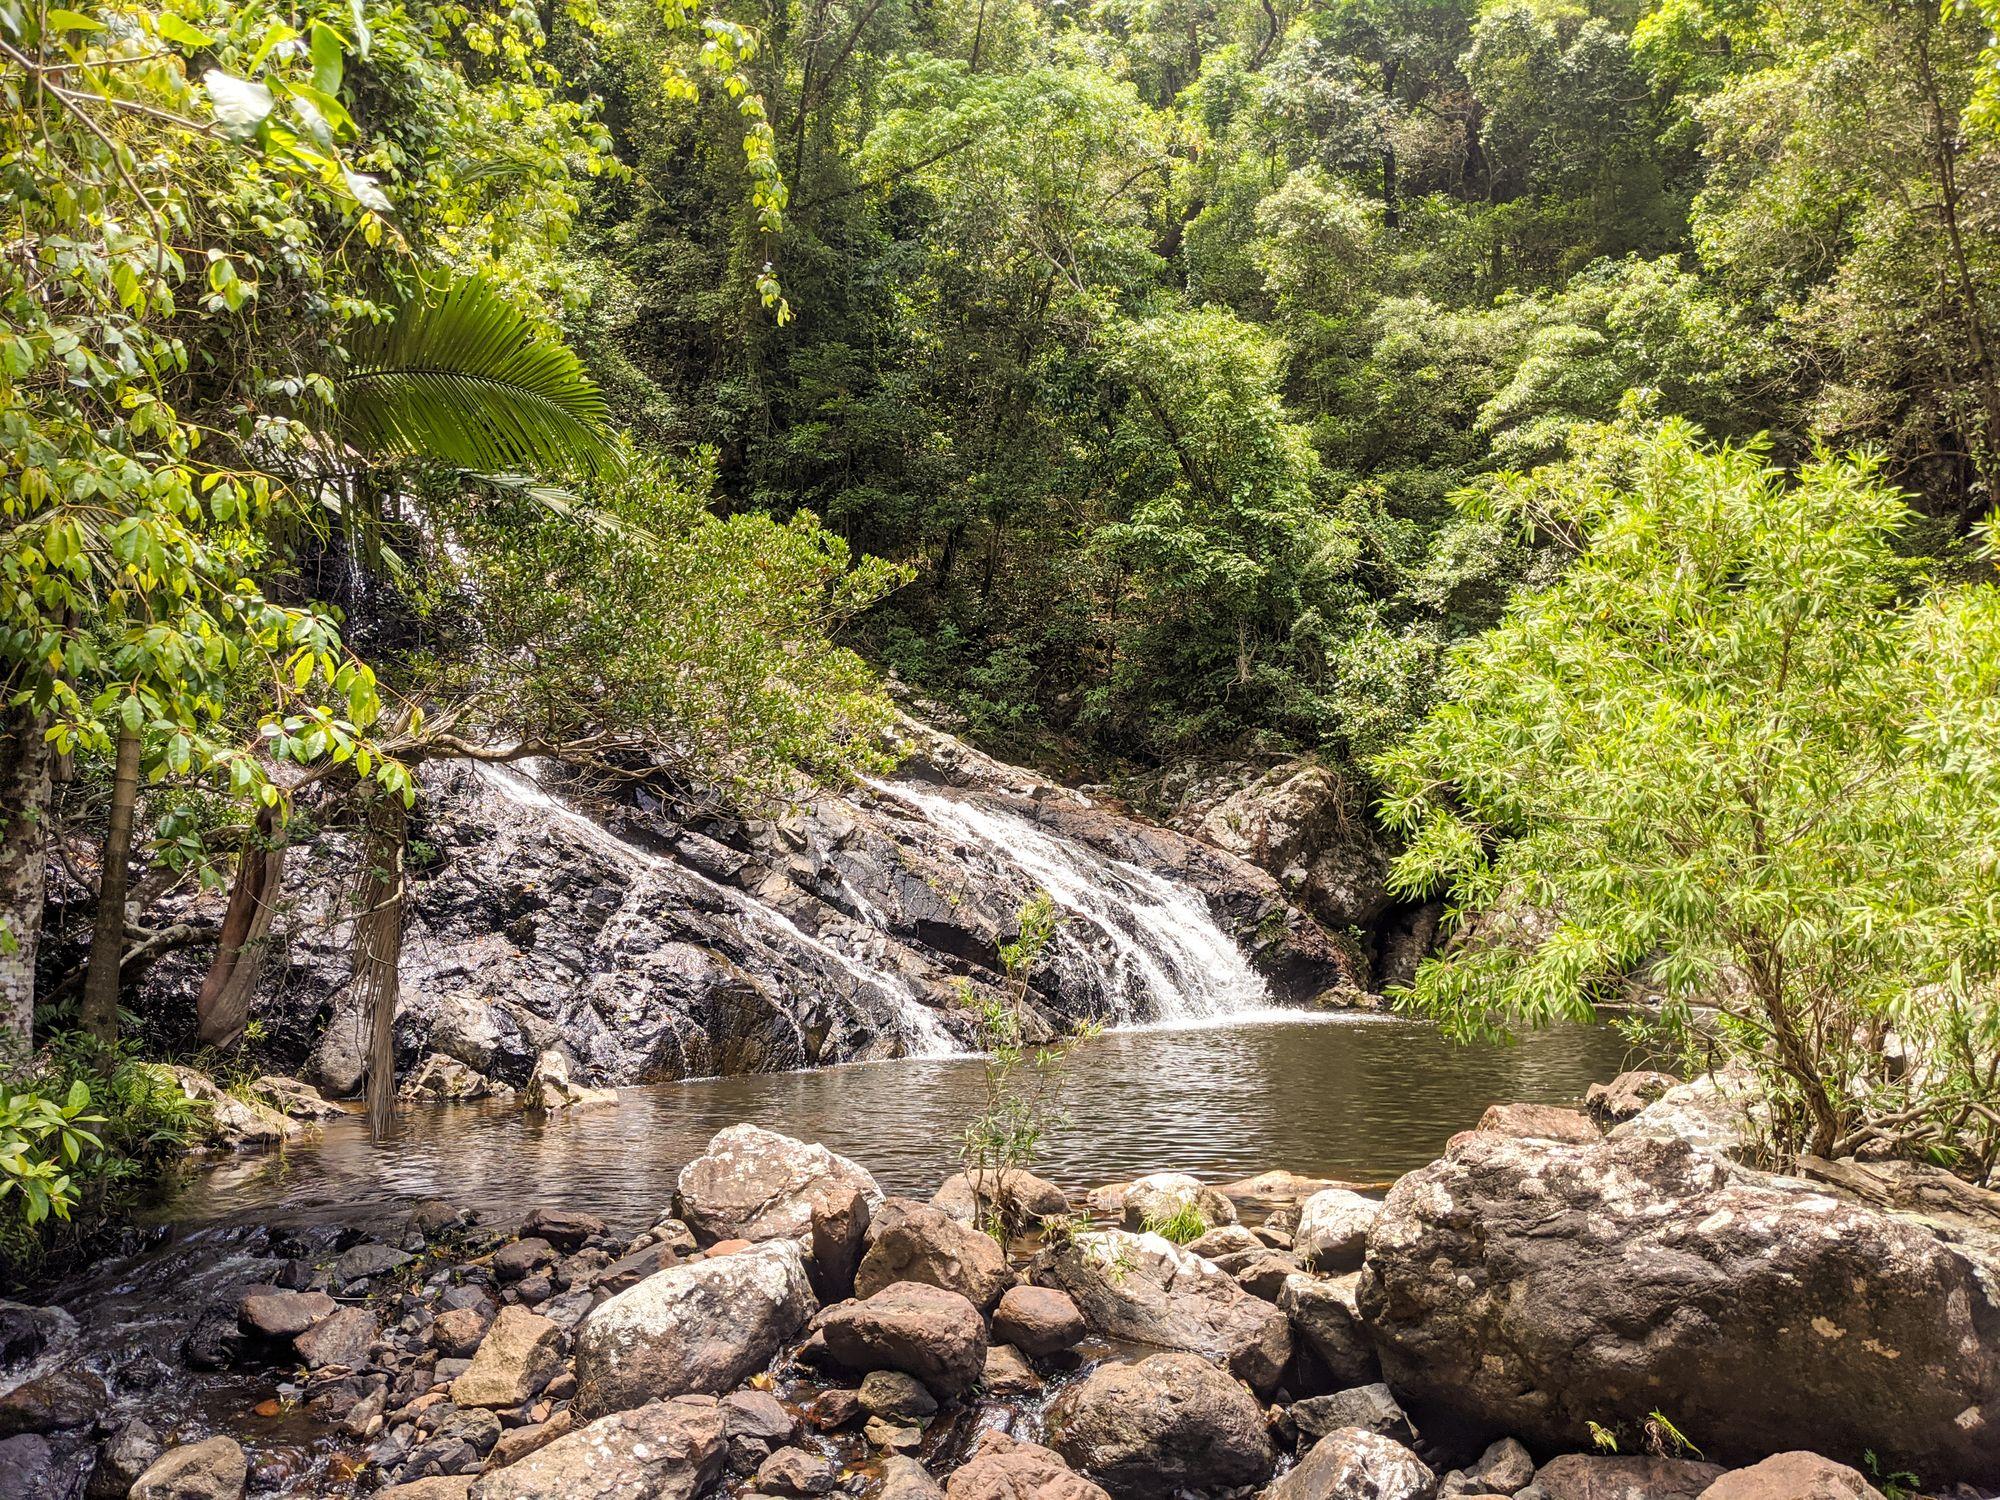 Tinkle Creek